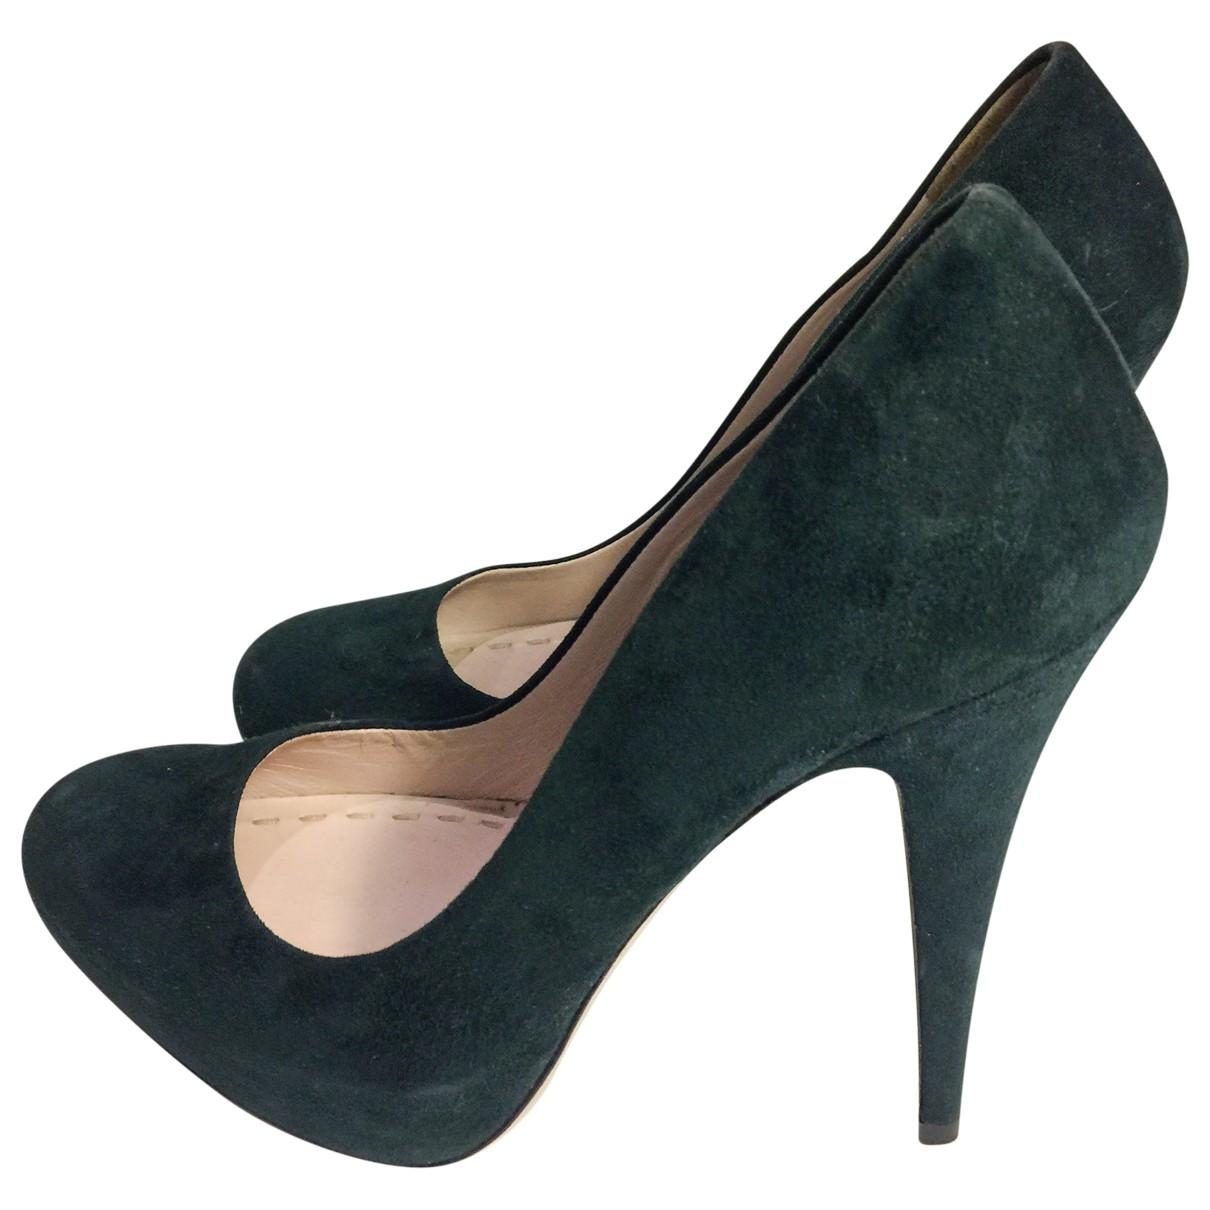 Miu Miu - Escarpins   pour femme en suede - vert